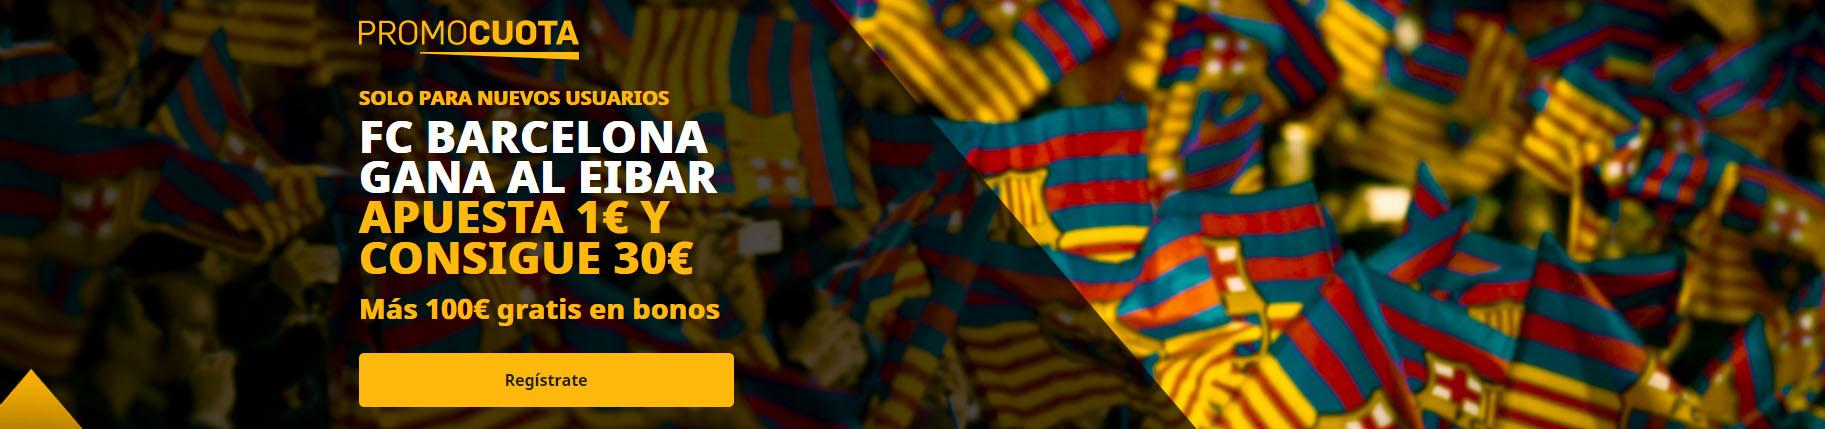 Promocuota Barcelona supera a Eibar